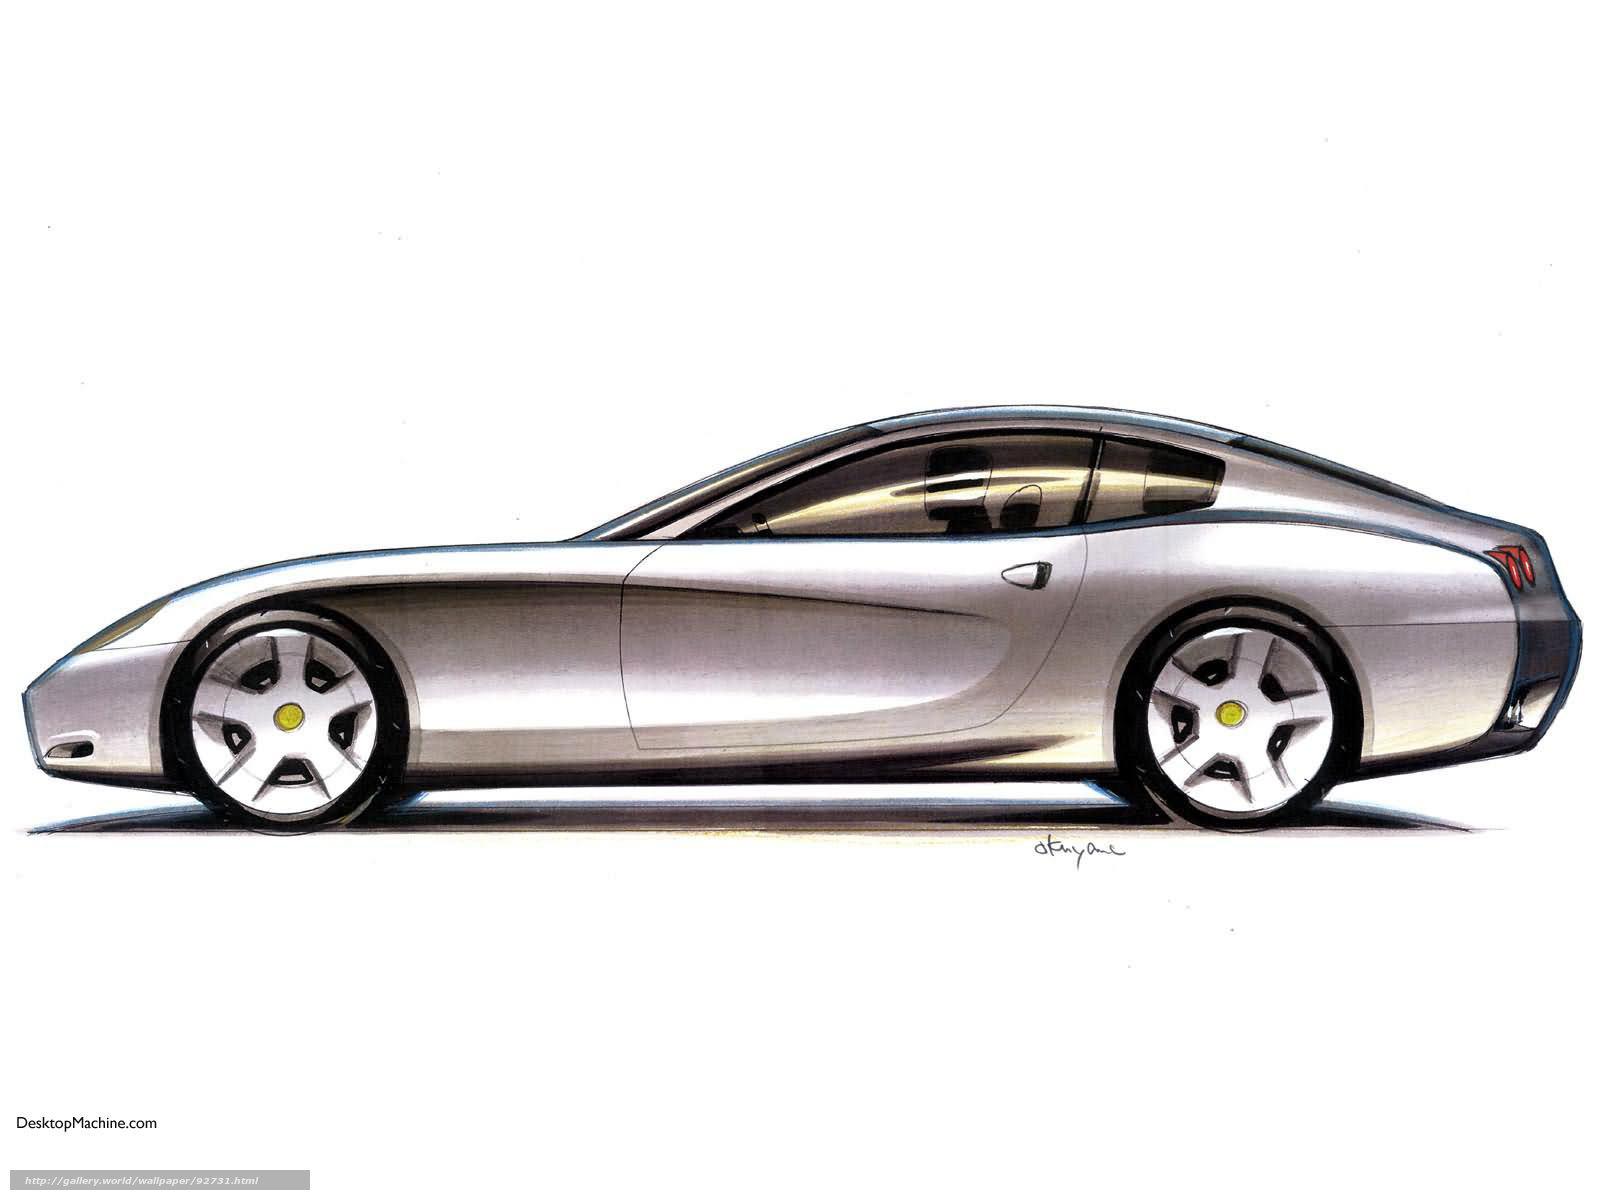 Download wallpaper Ferrari,  90210,  auto,  Machines free desktop wallpaper in the resolution 1600x1200 — picture №92731